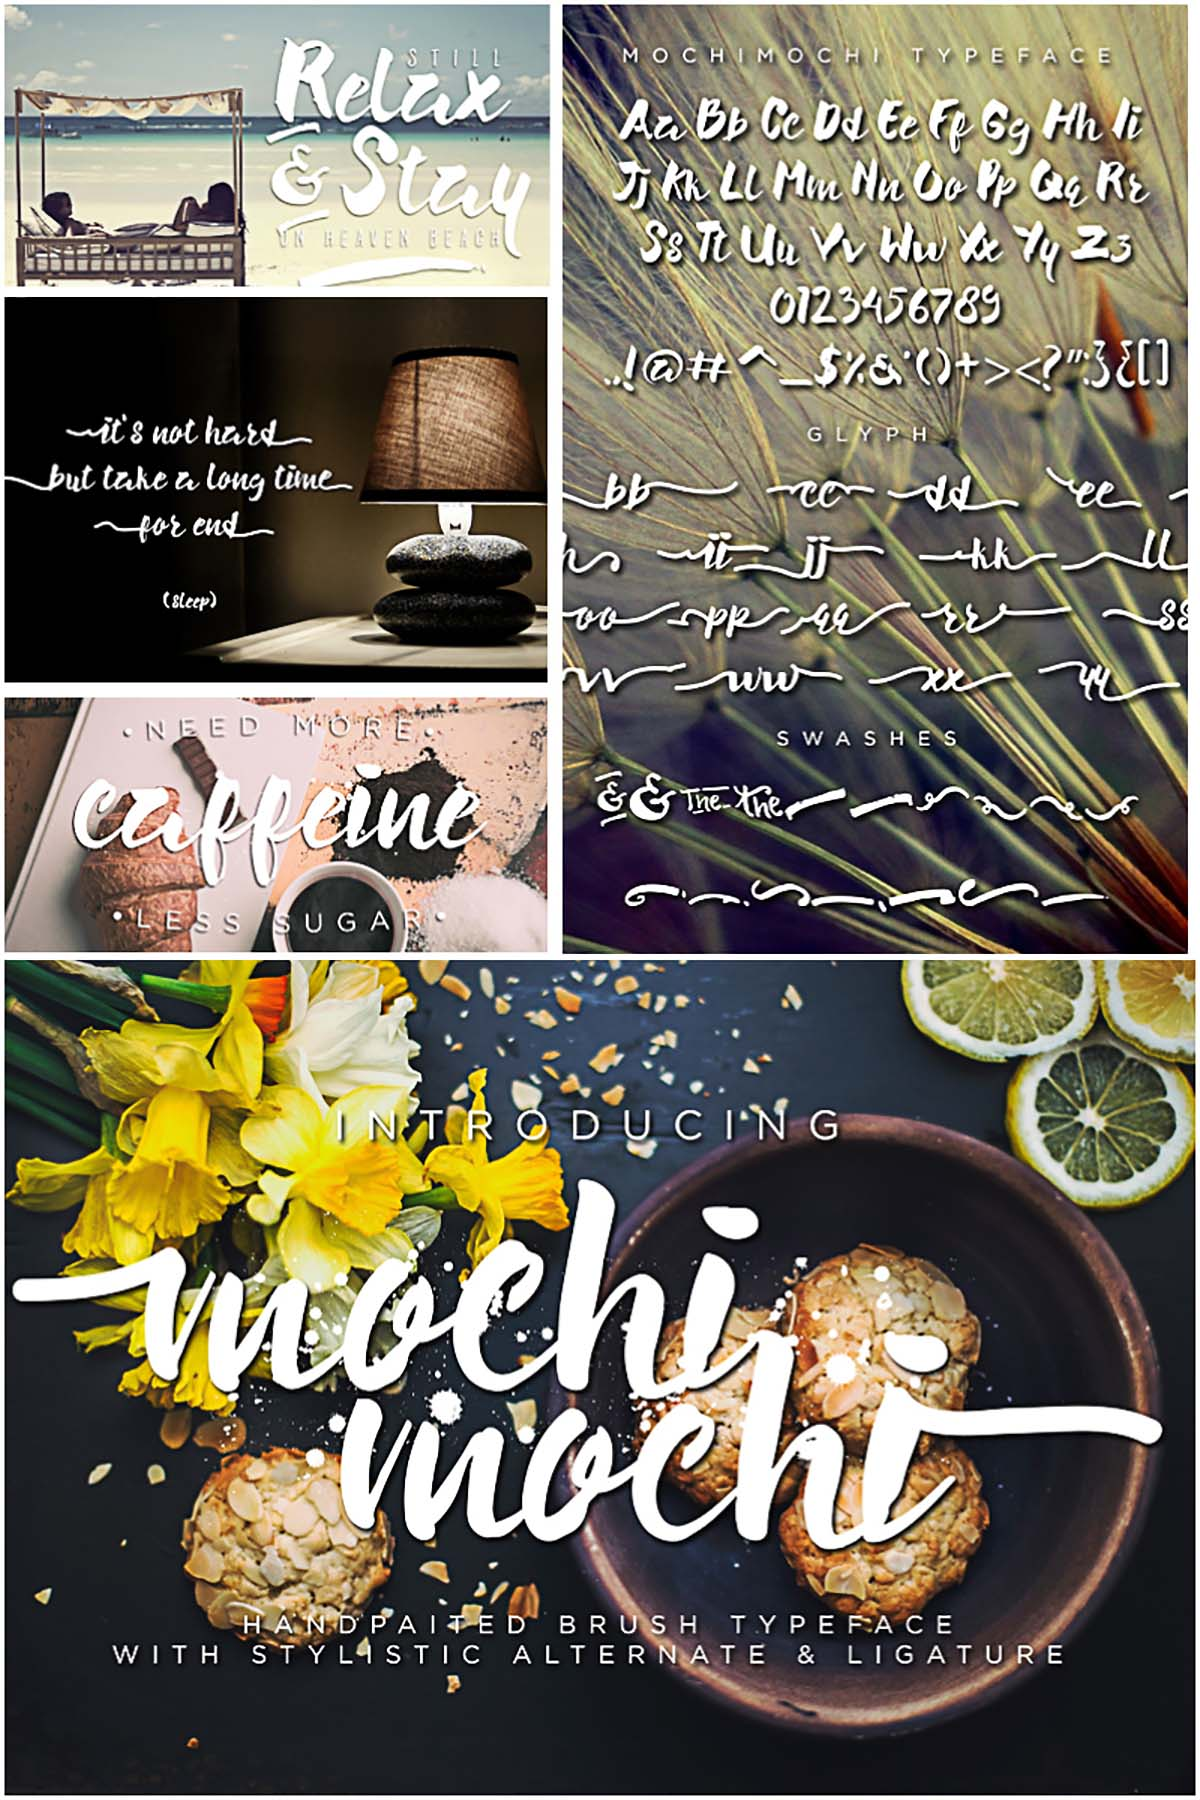 Mochimochi handpainted font